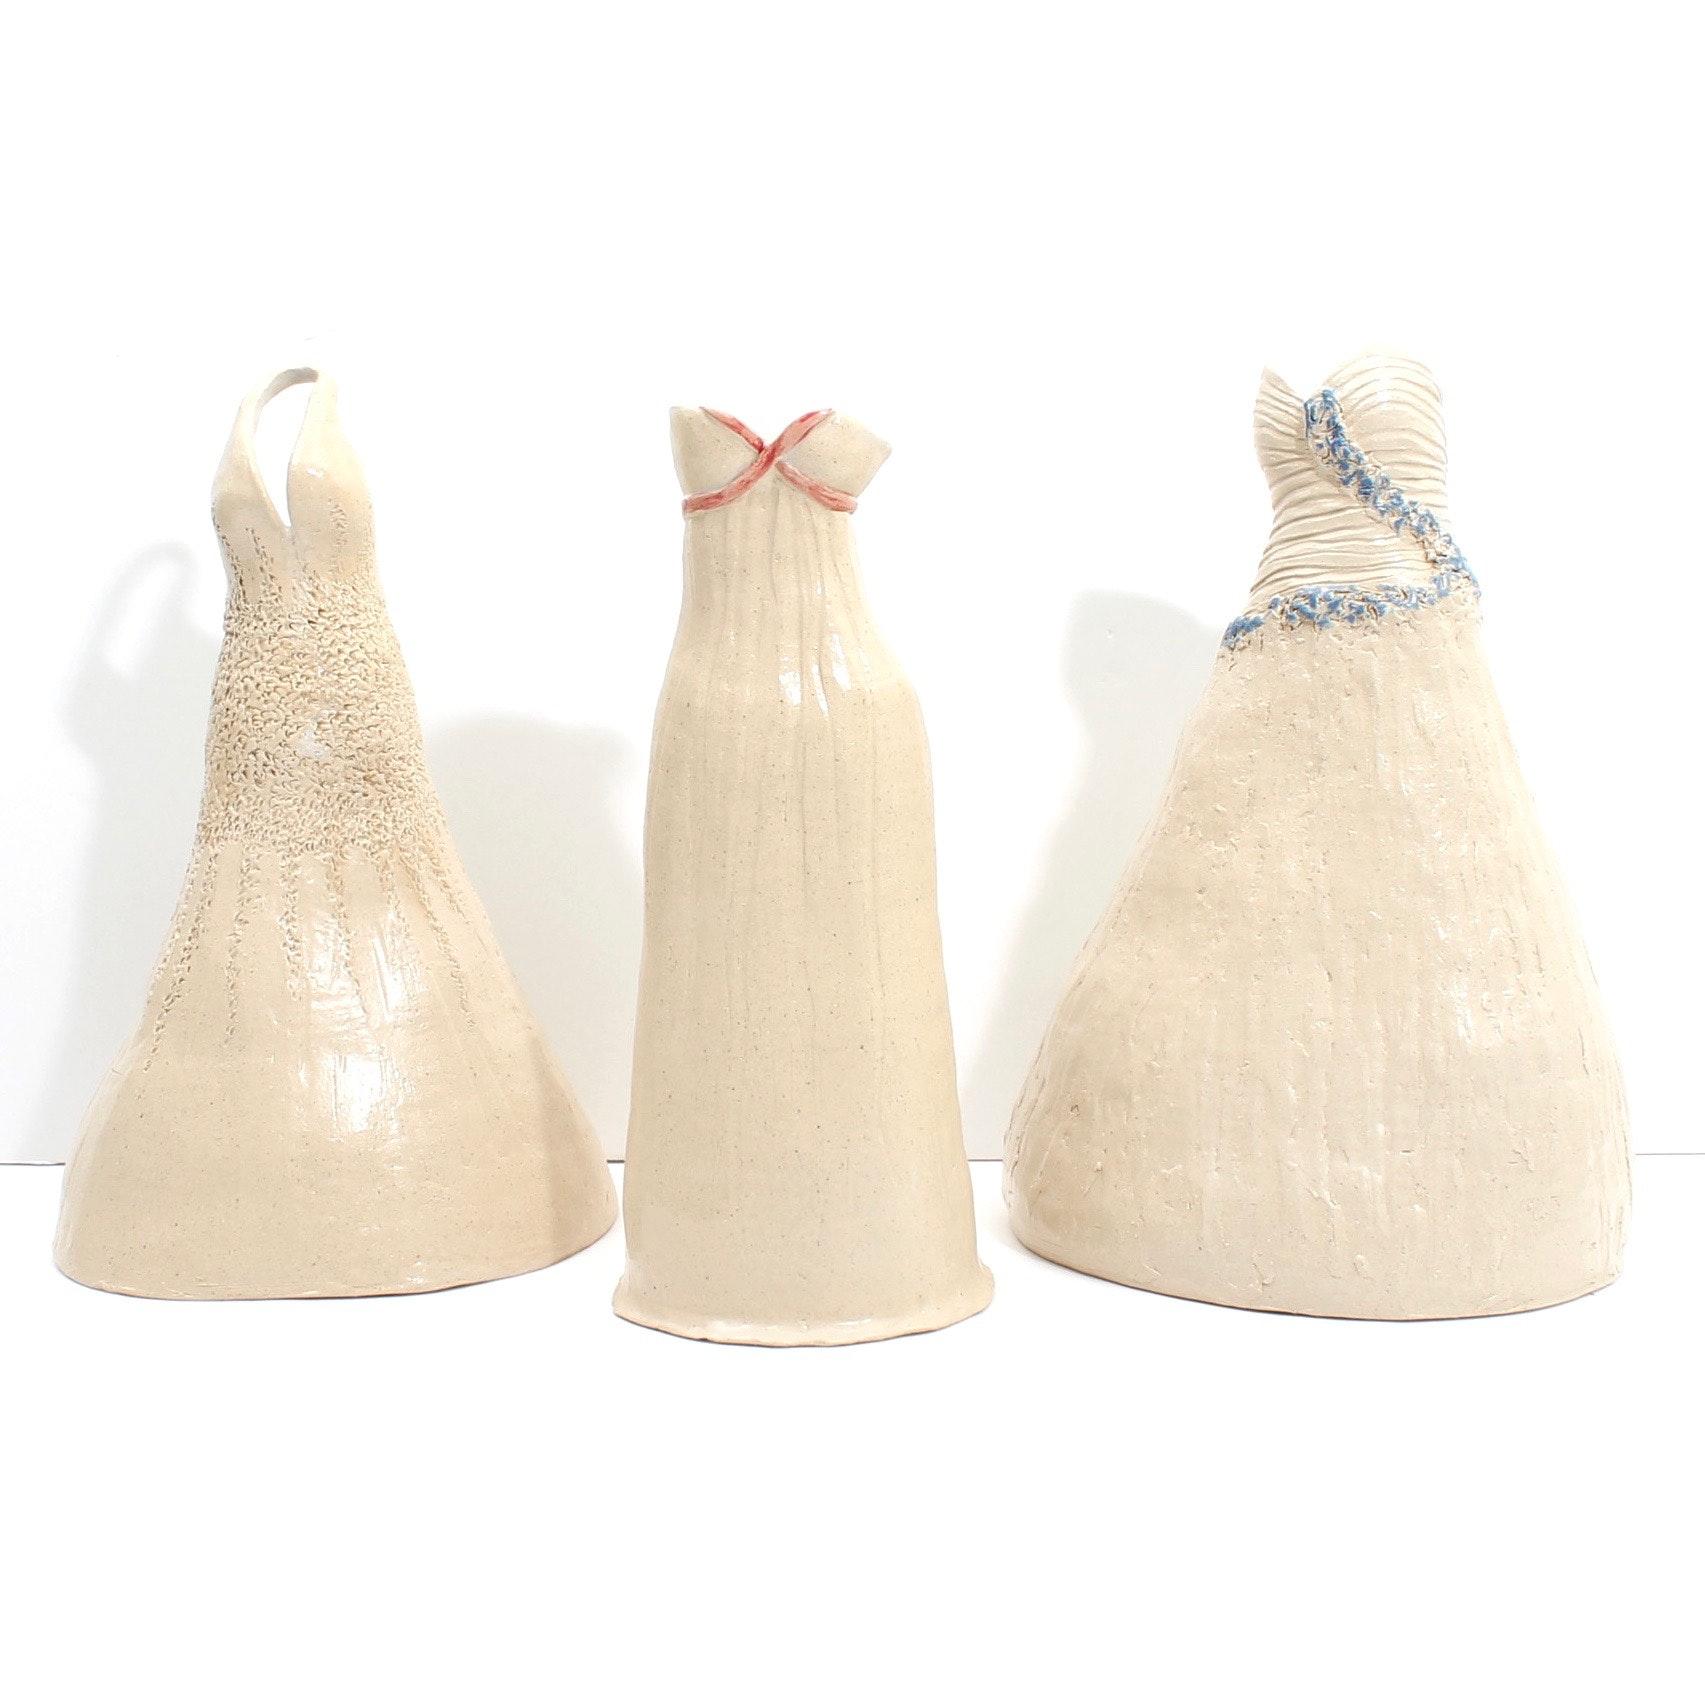 Susan Borthwick Handbuilt Art Pottery Vases Depicting Dresses